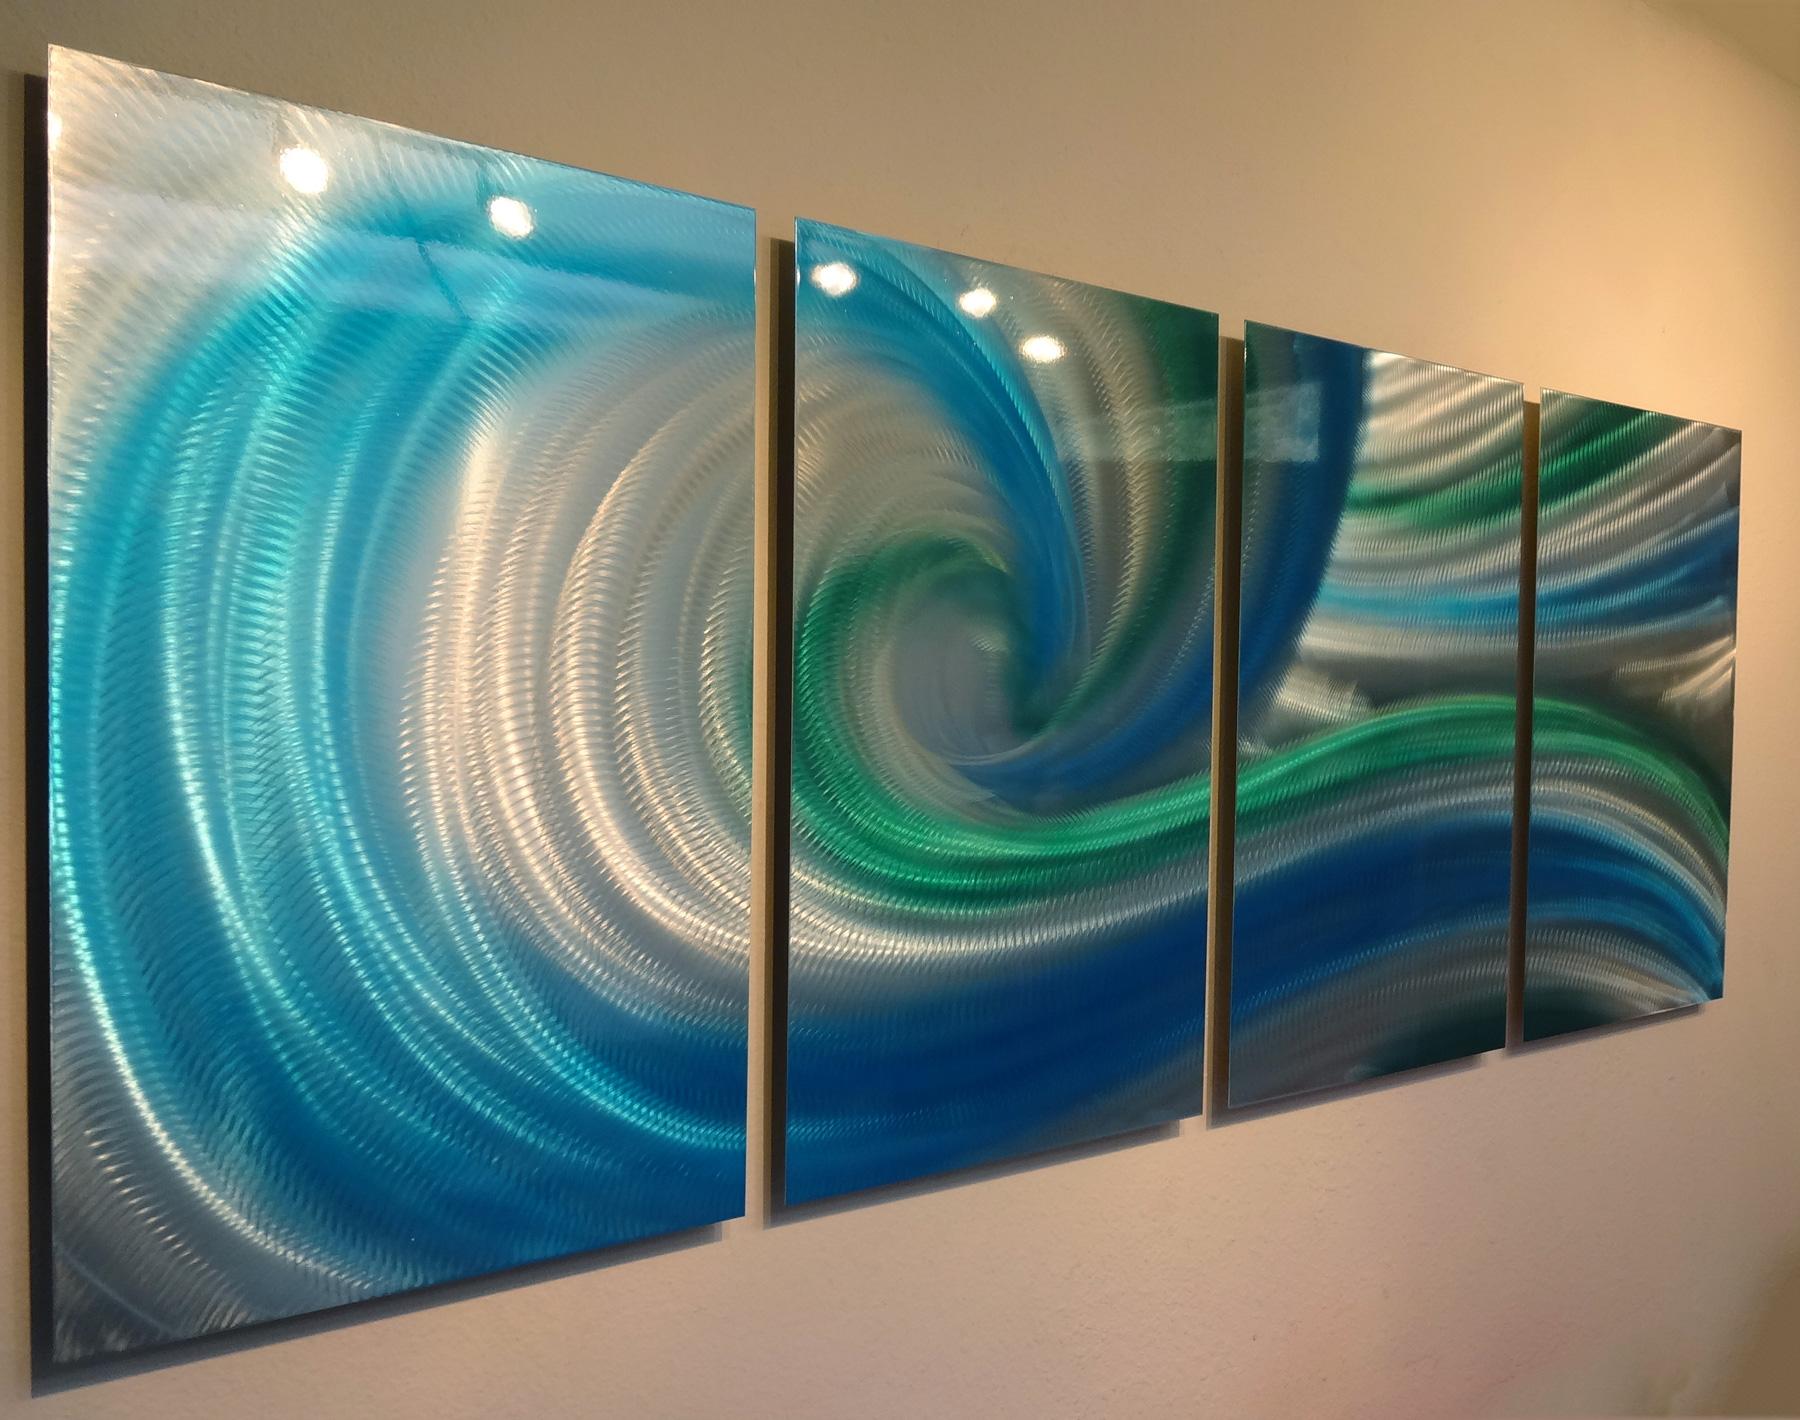 Spring crest metal wall art abstract contemporary modern decor inspiring art gallery online - Crest home design curtains ...